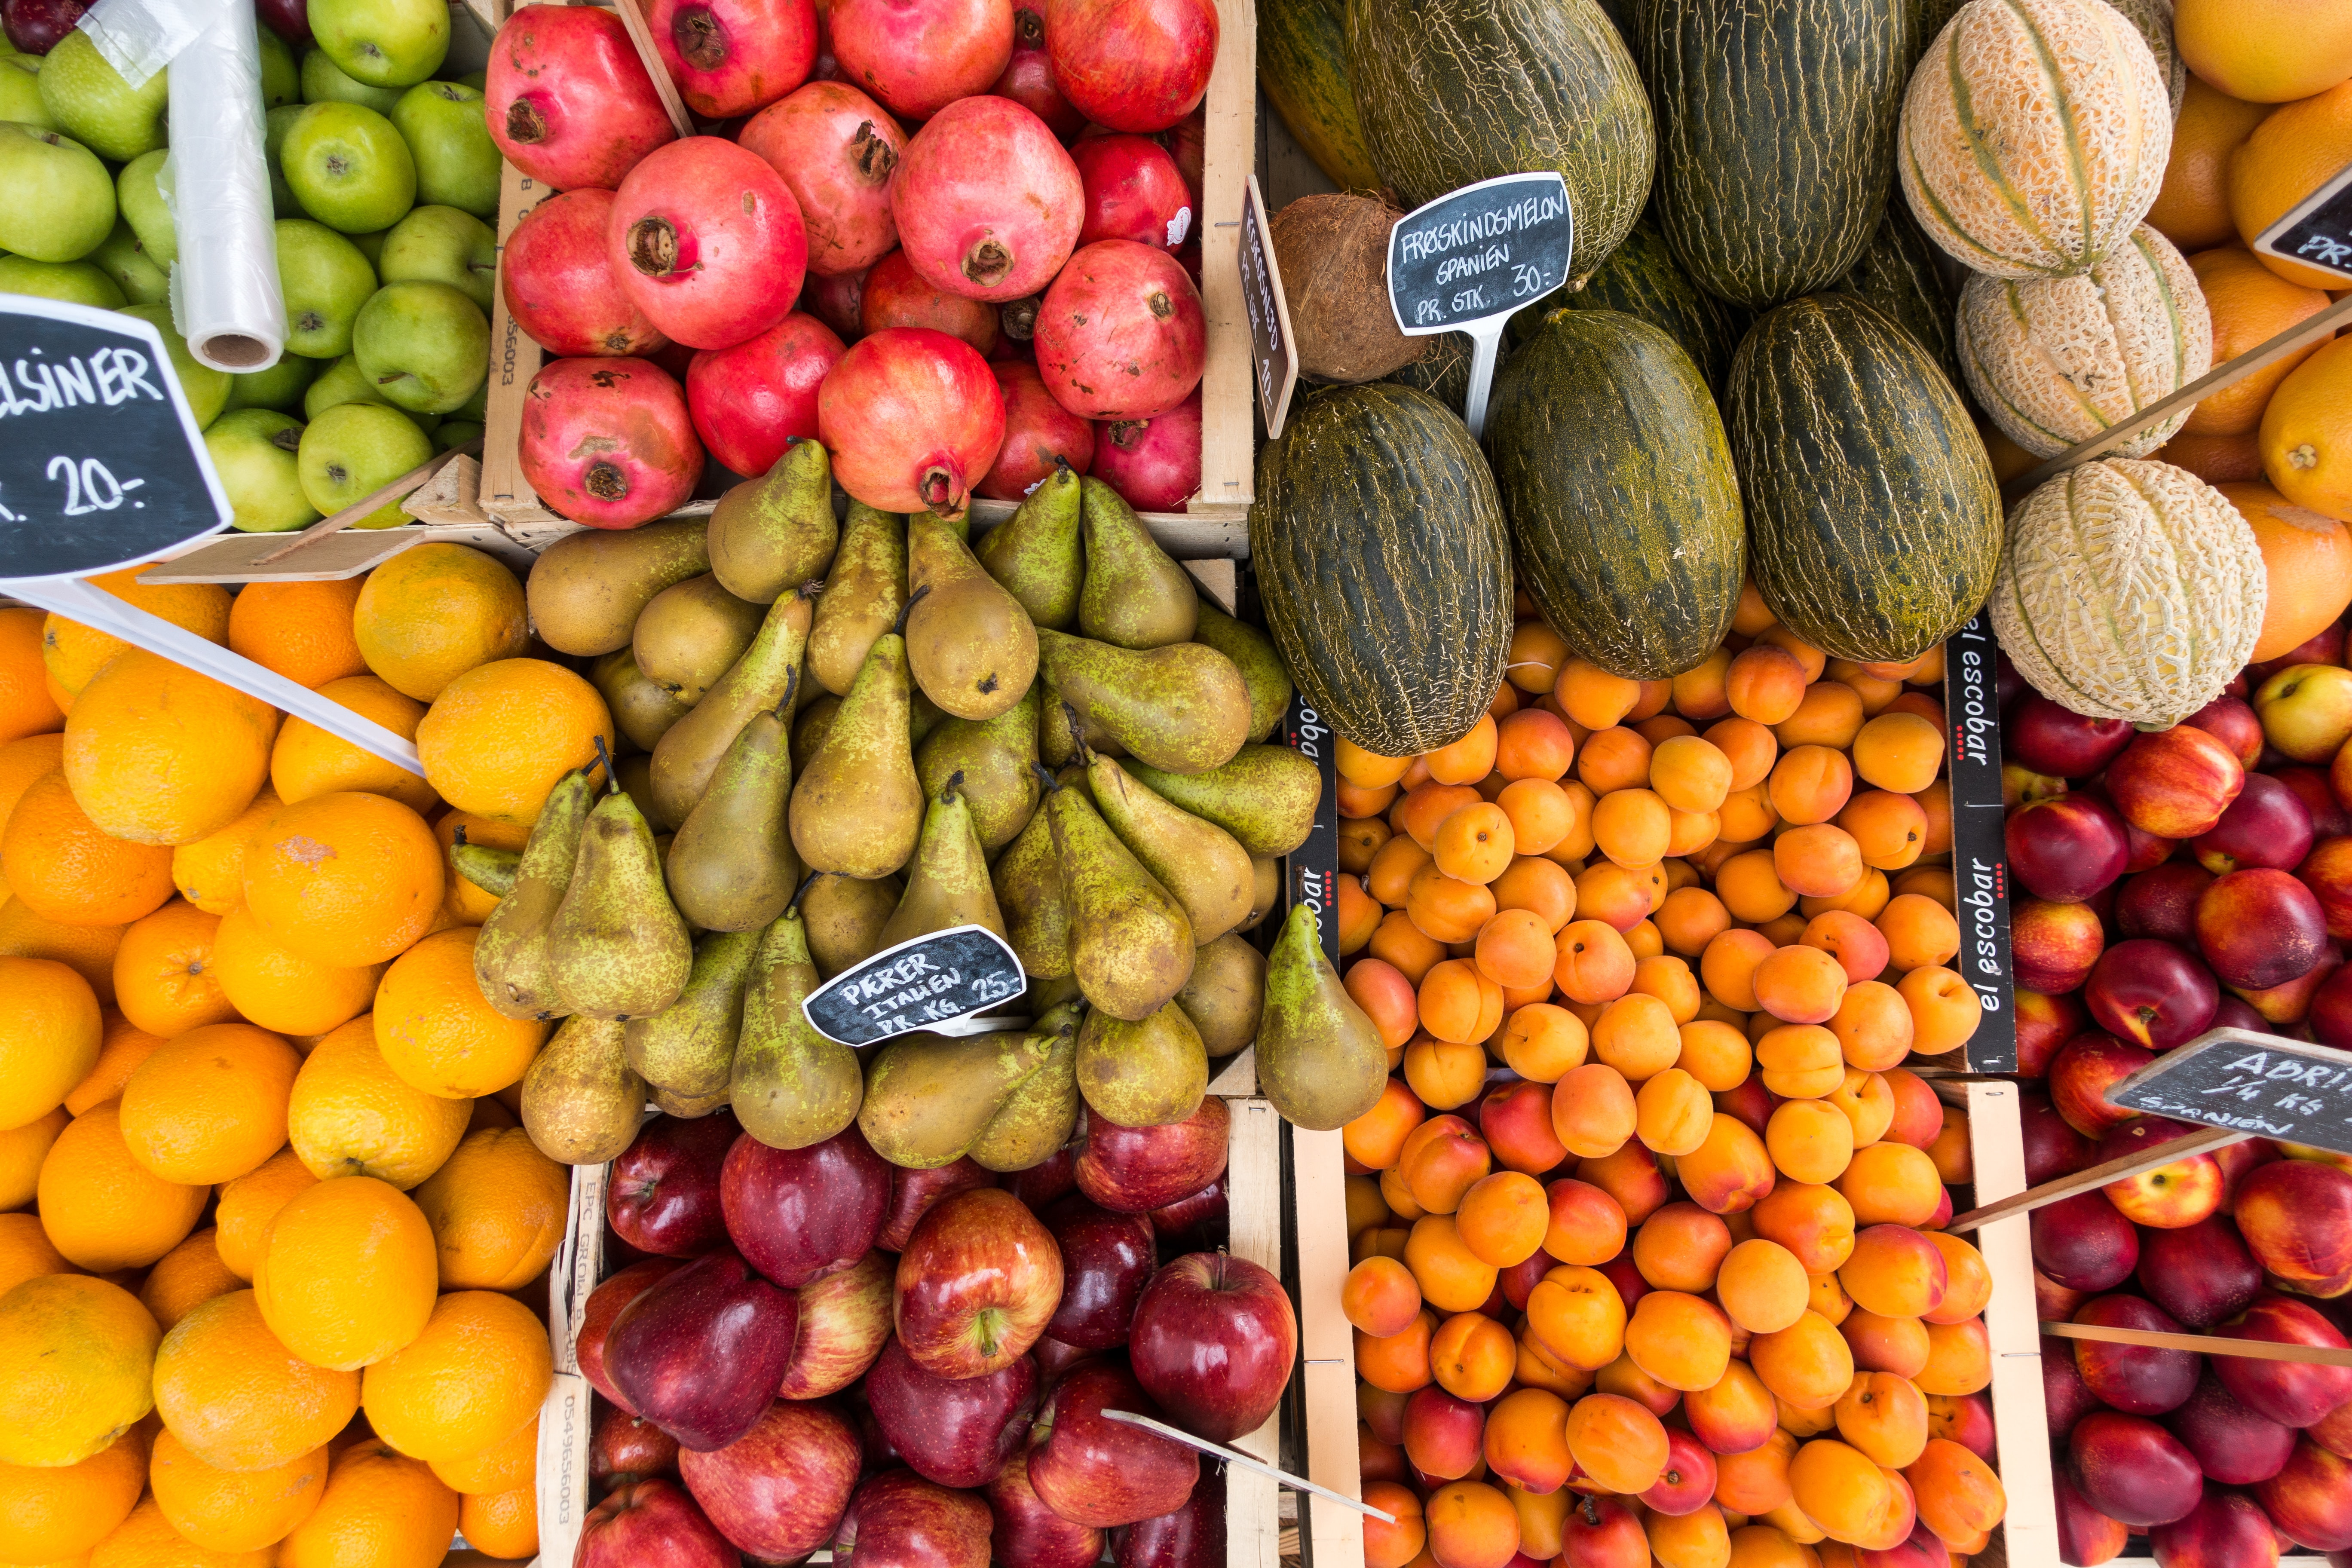 Little Italy Wednesday Market